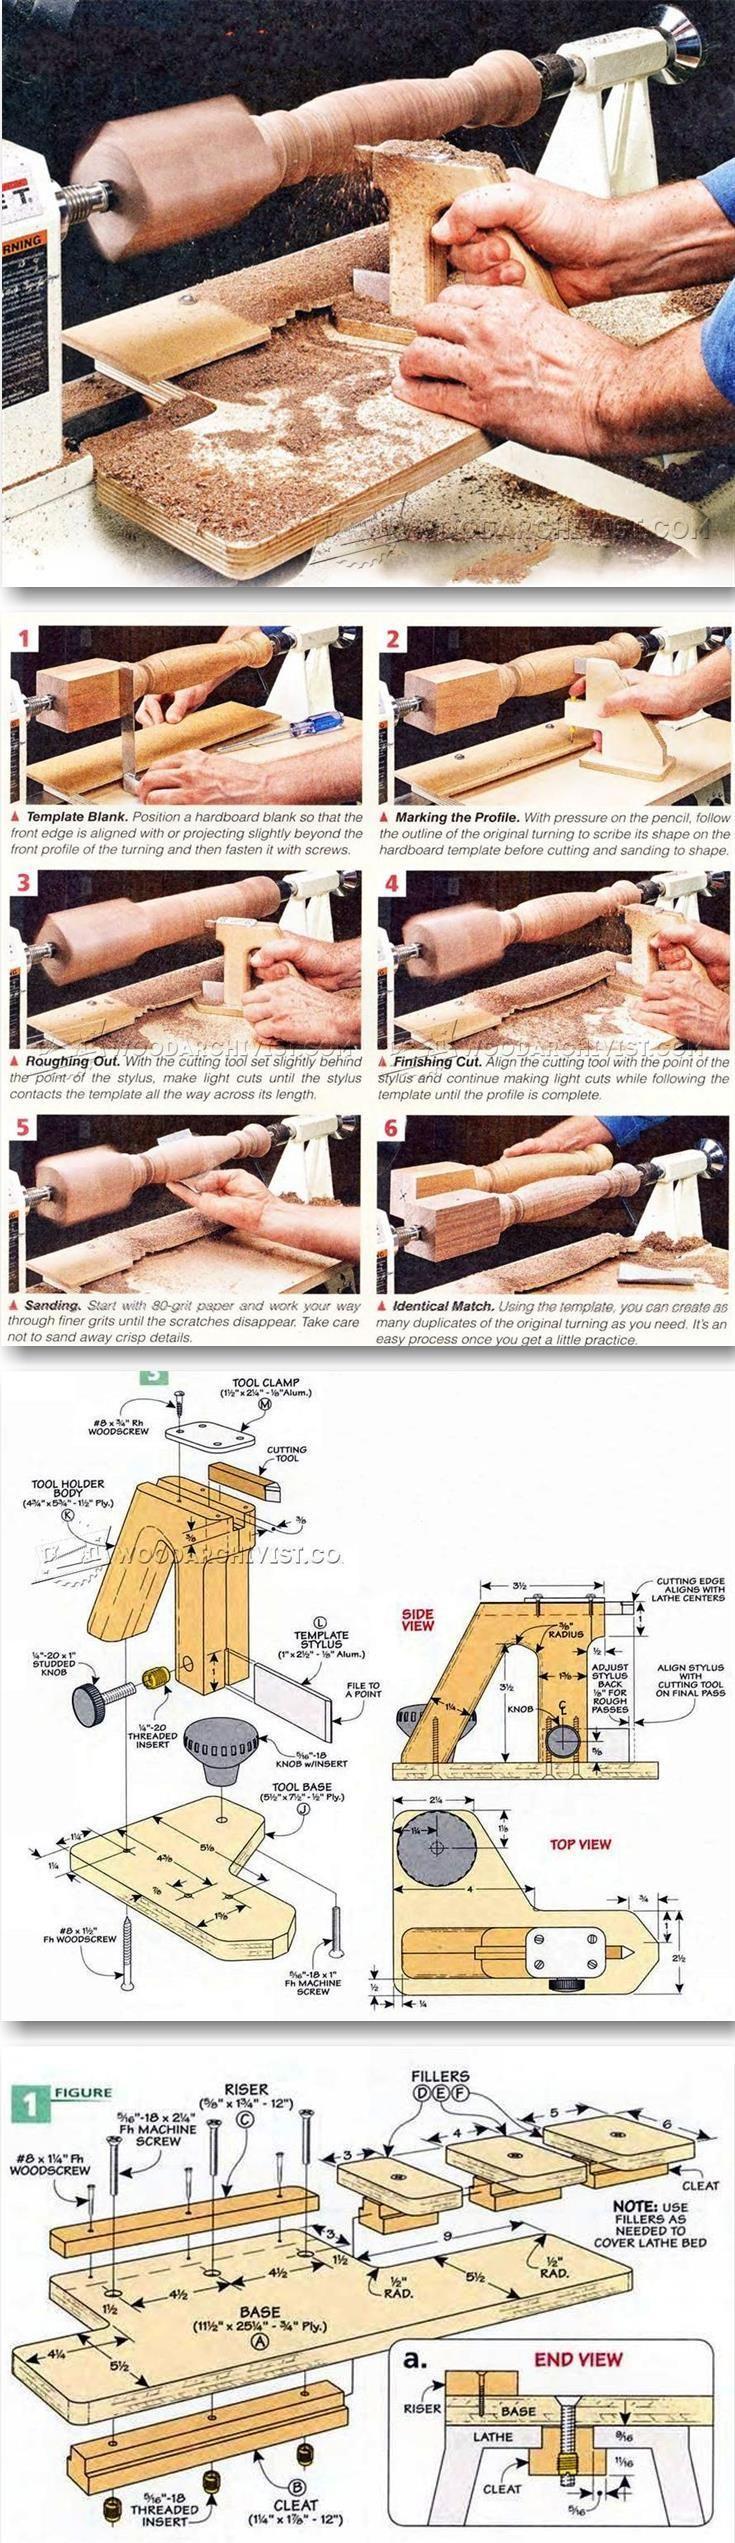 DIY Wood Lathe Duplicator - Lathe Tips, Jigs and Fixtures | WoodArchivist.com